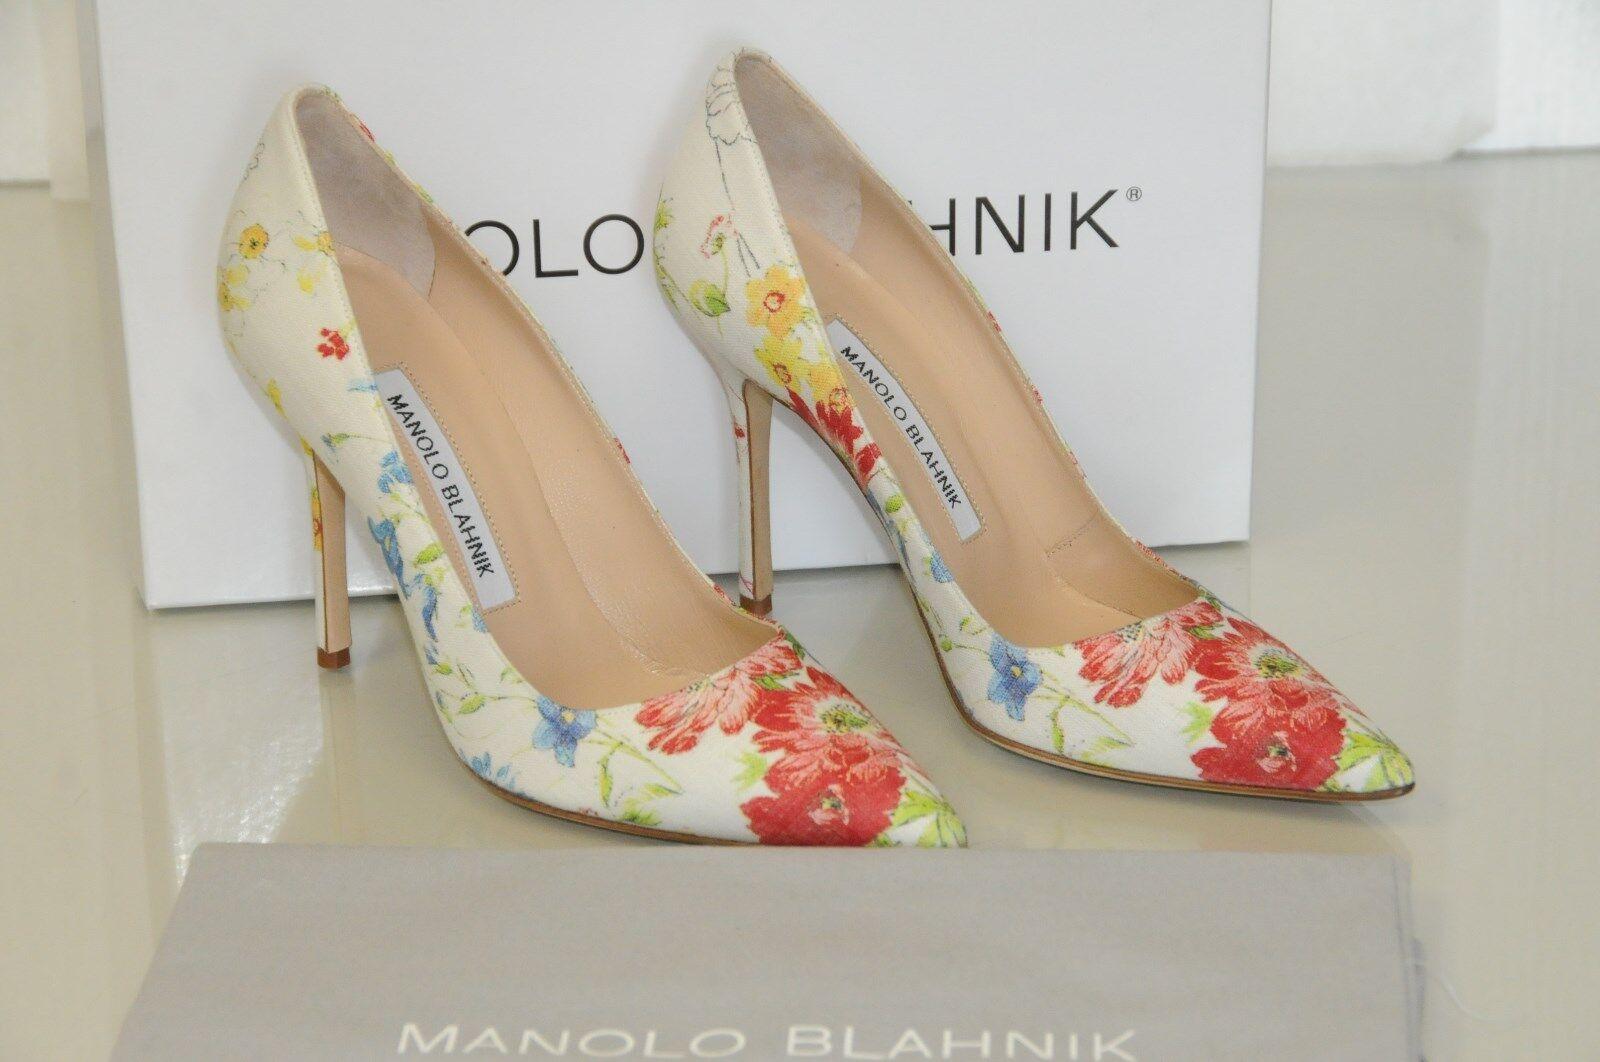 New Floral MANOLO BLAHNIK BB 105 Flower Floral New ROT blau Cream schuhes 36.5 38 39.5 41.5 eaeca4